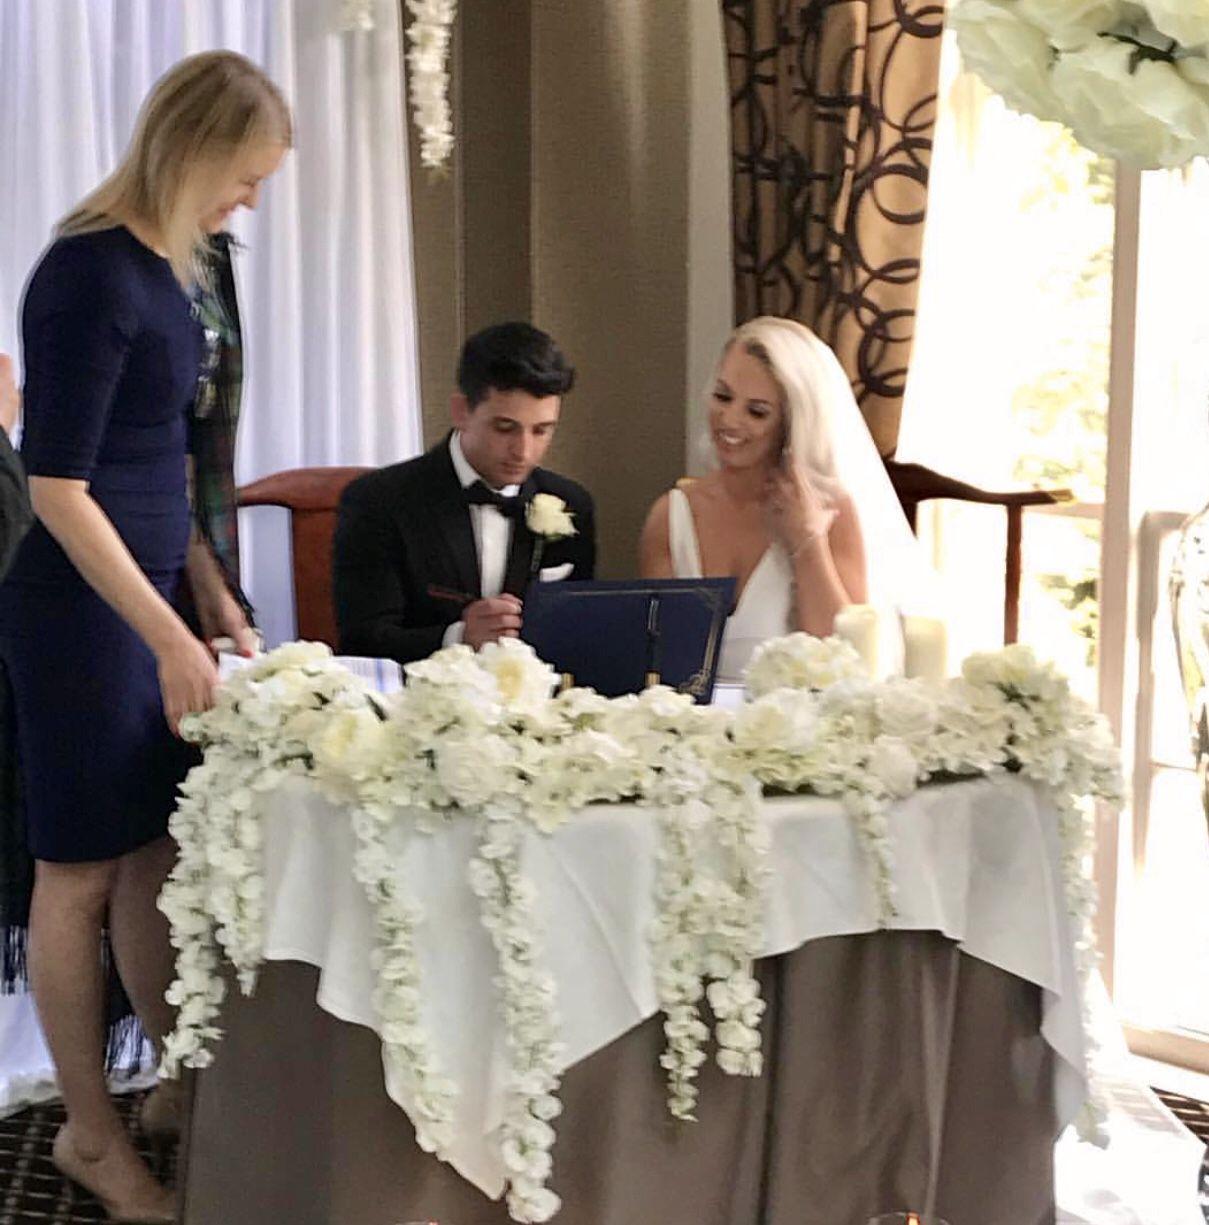 Pin de Aye Rocha en weddings